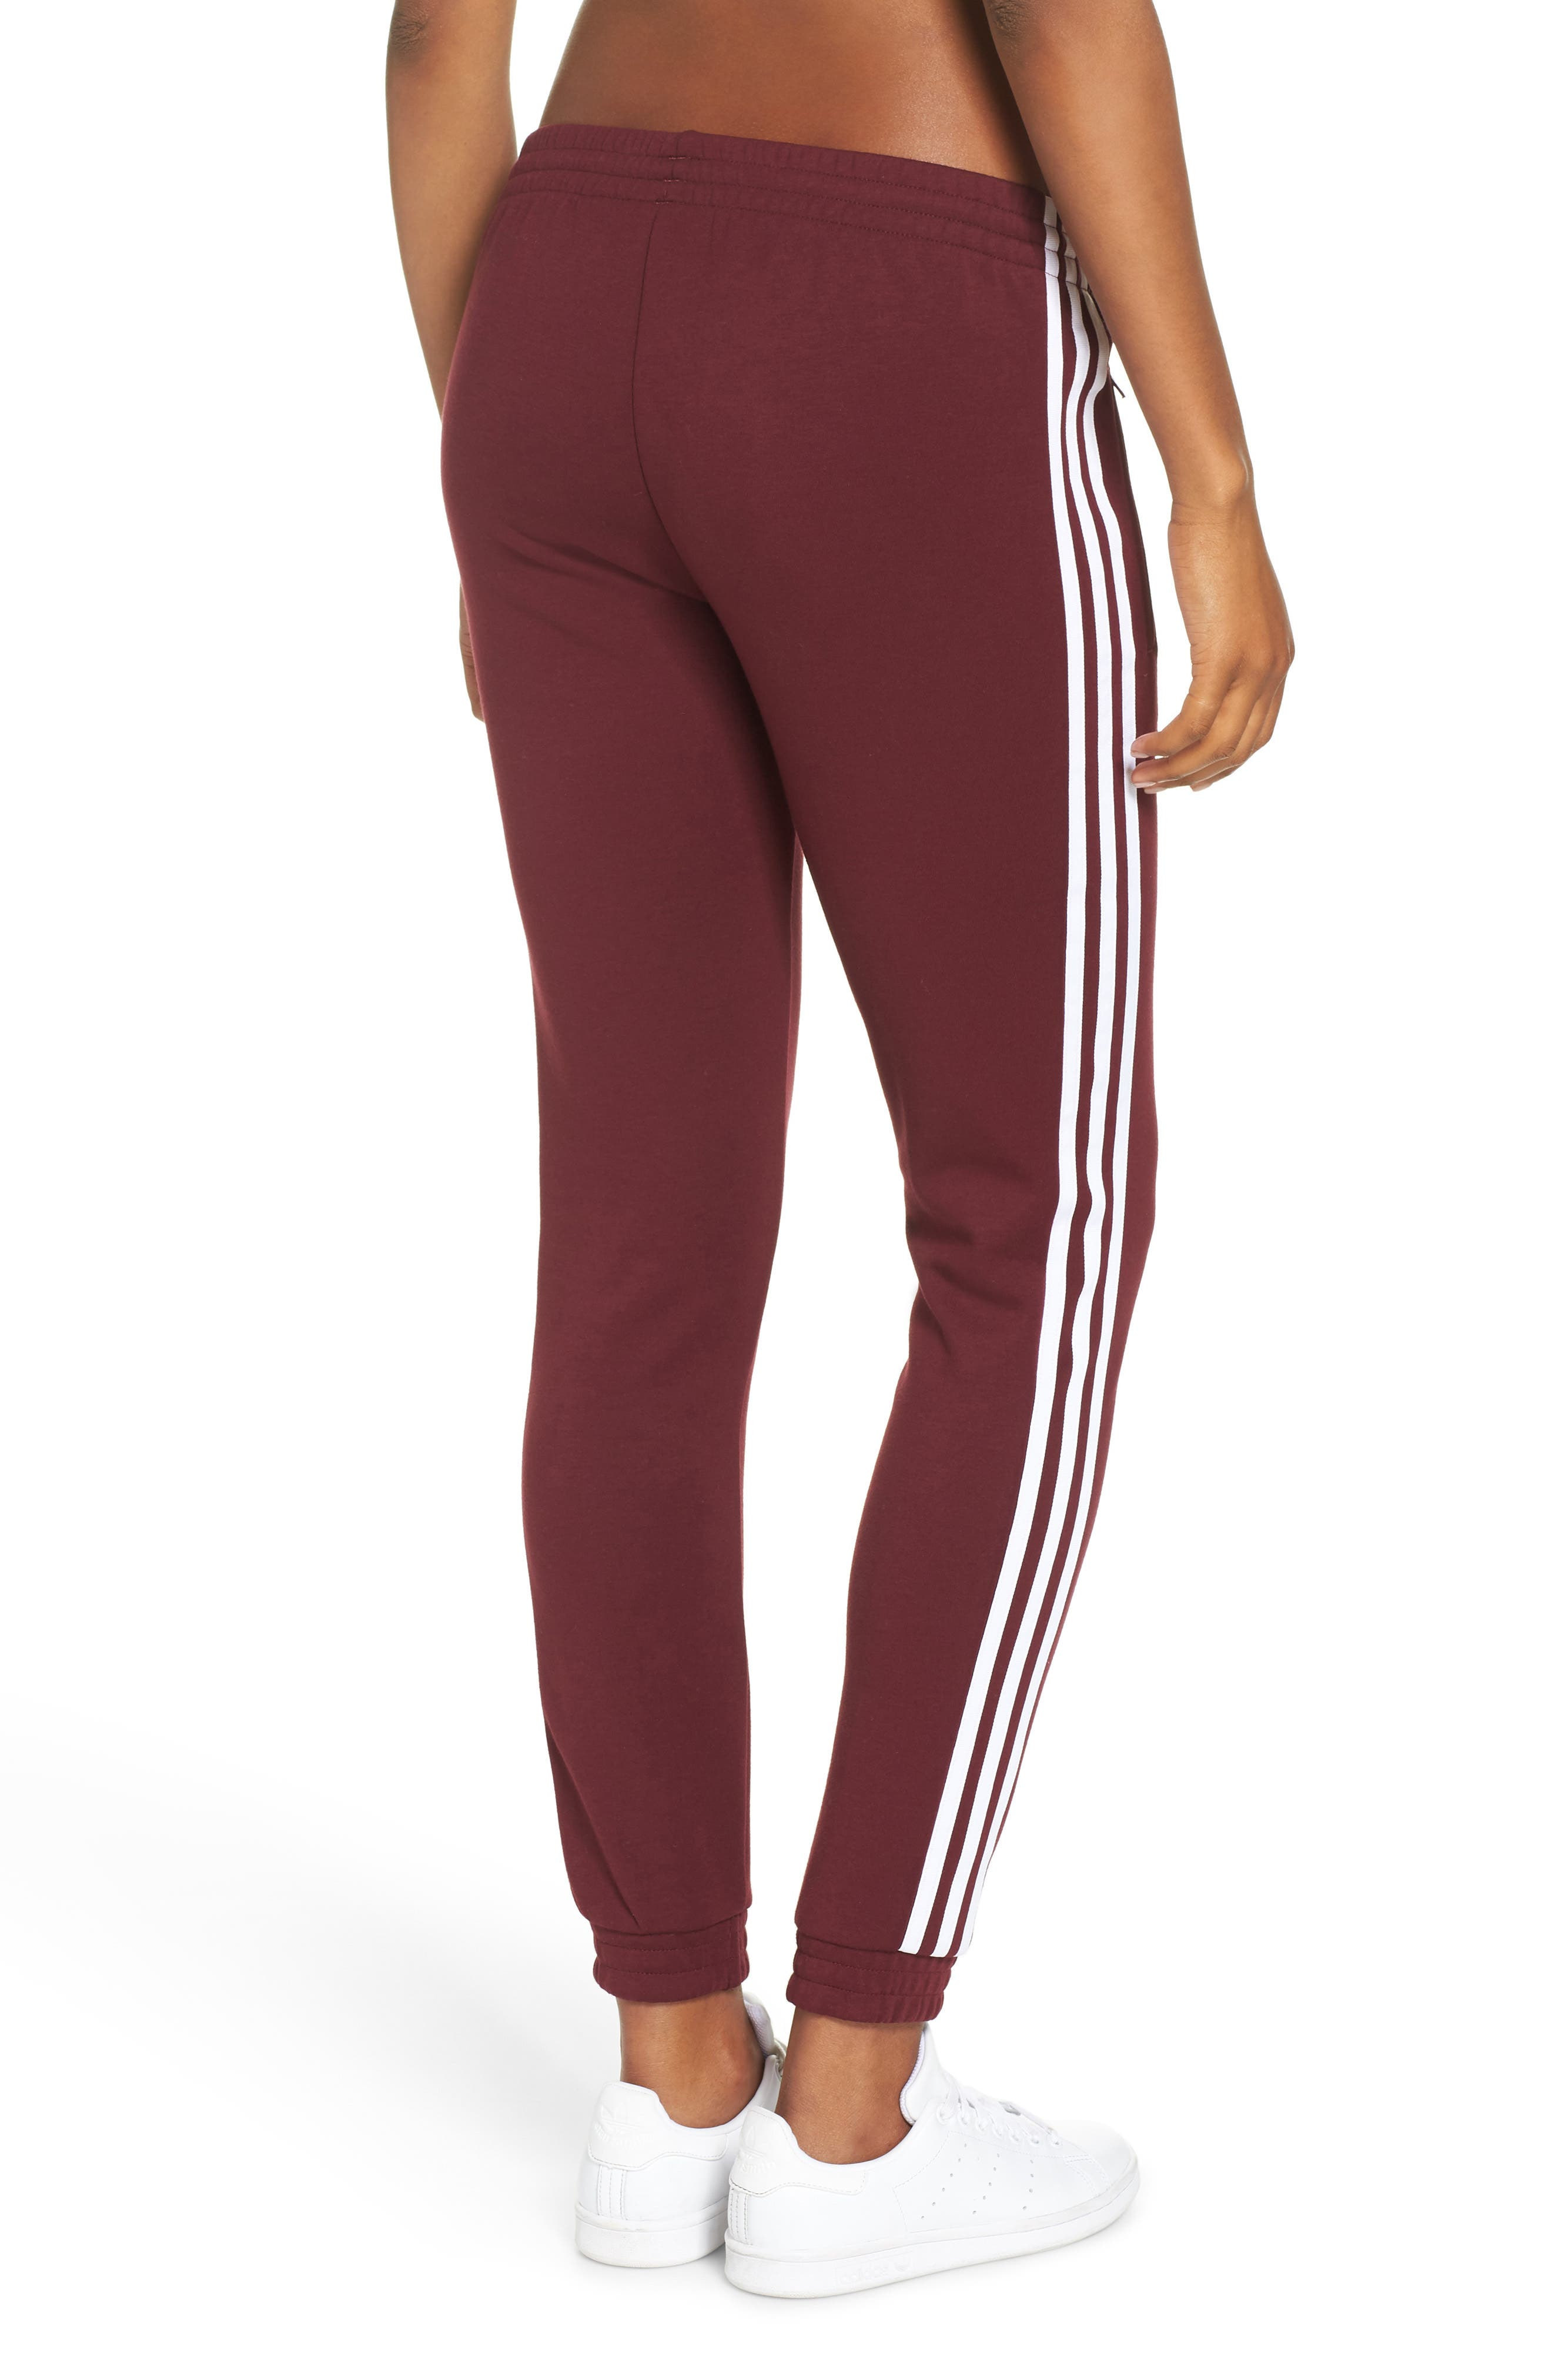 ADIDAS ORIGINALS,                             SST Track Pants,                             Alternate thumbnail 2, color,                             930